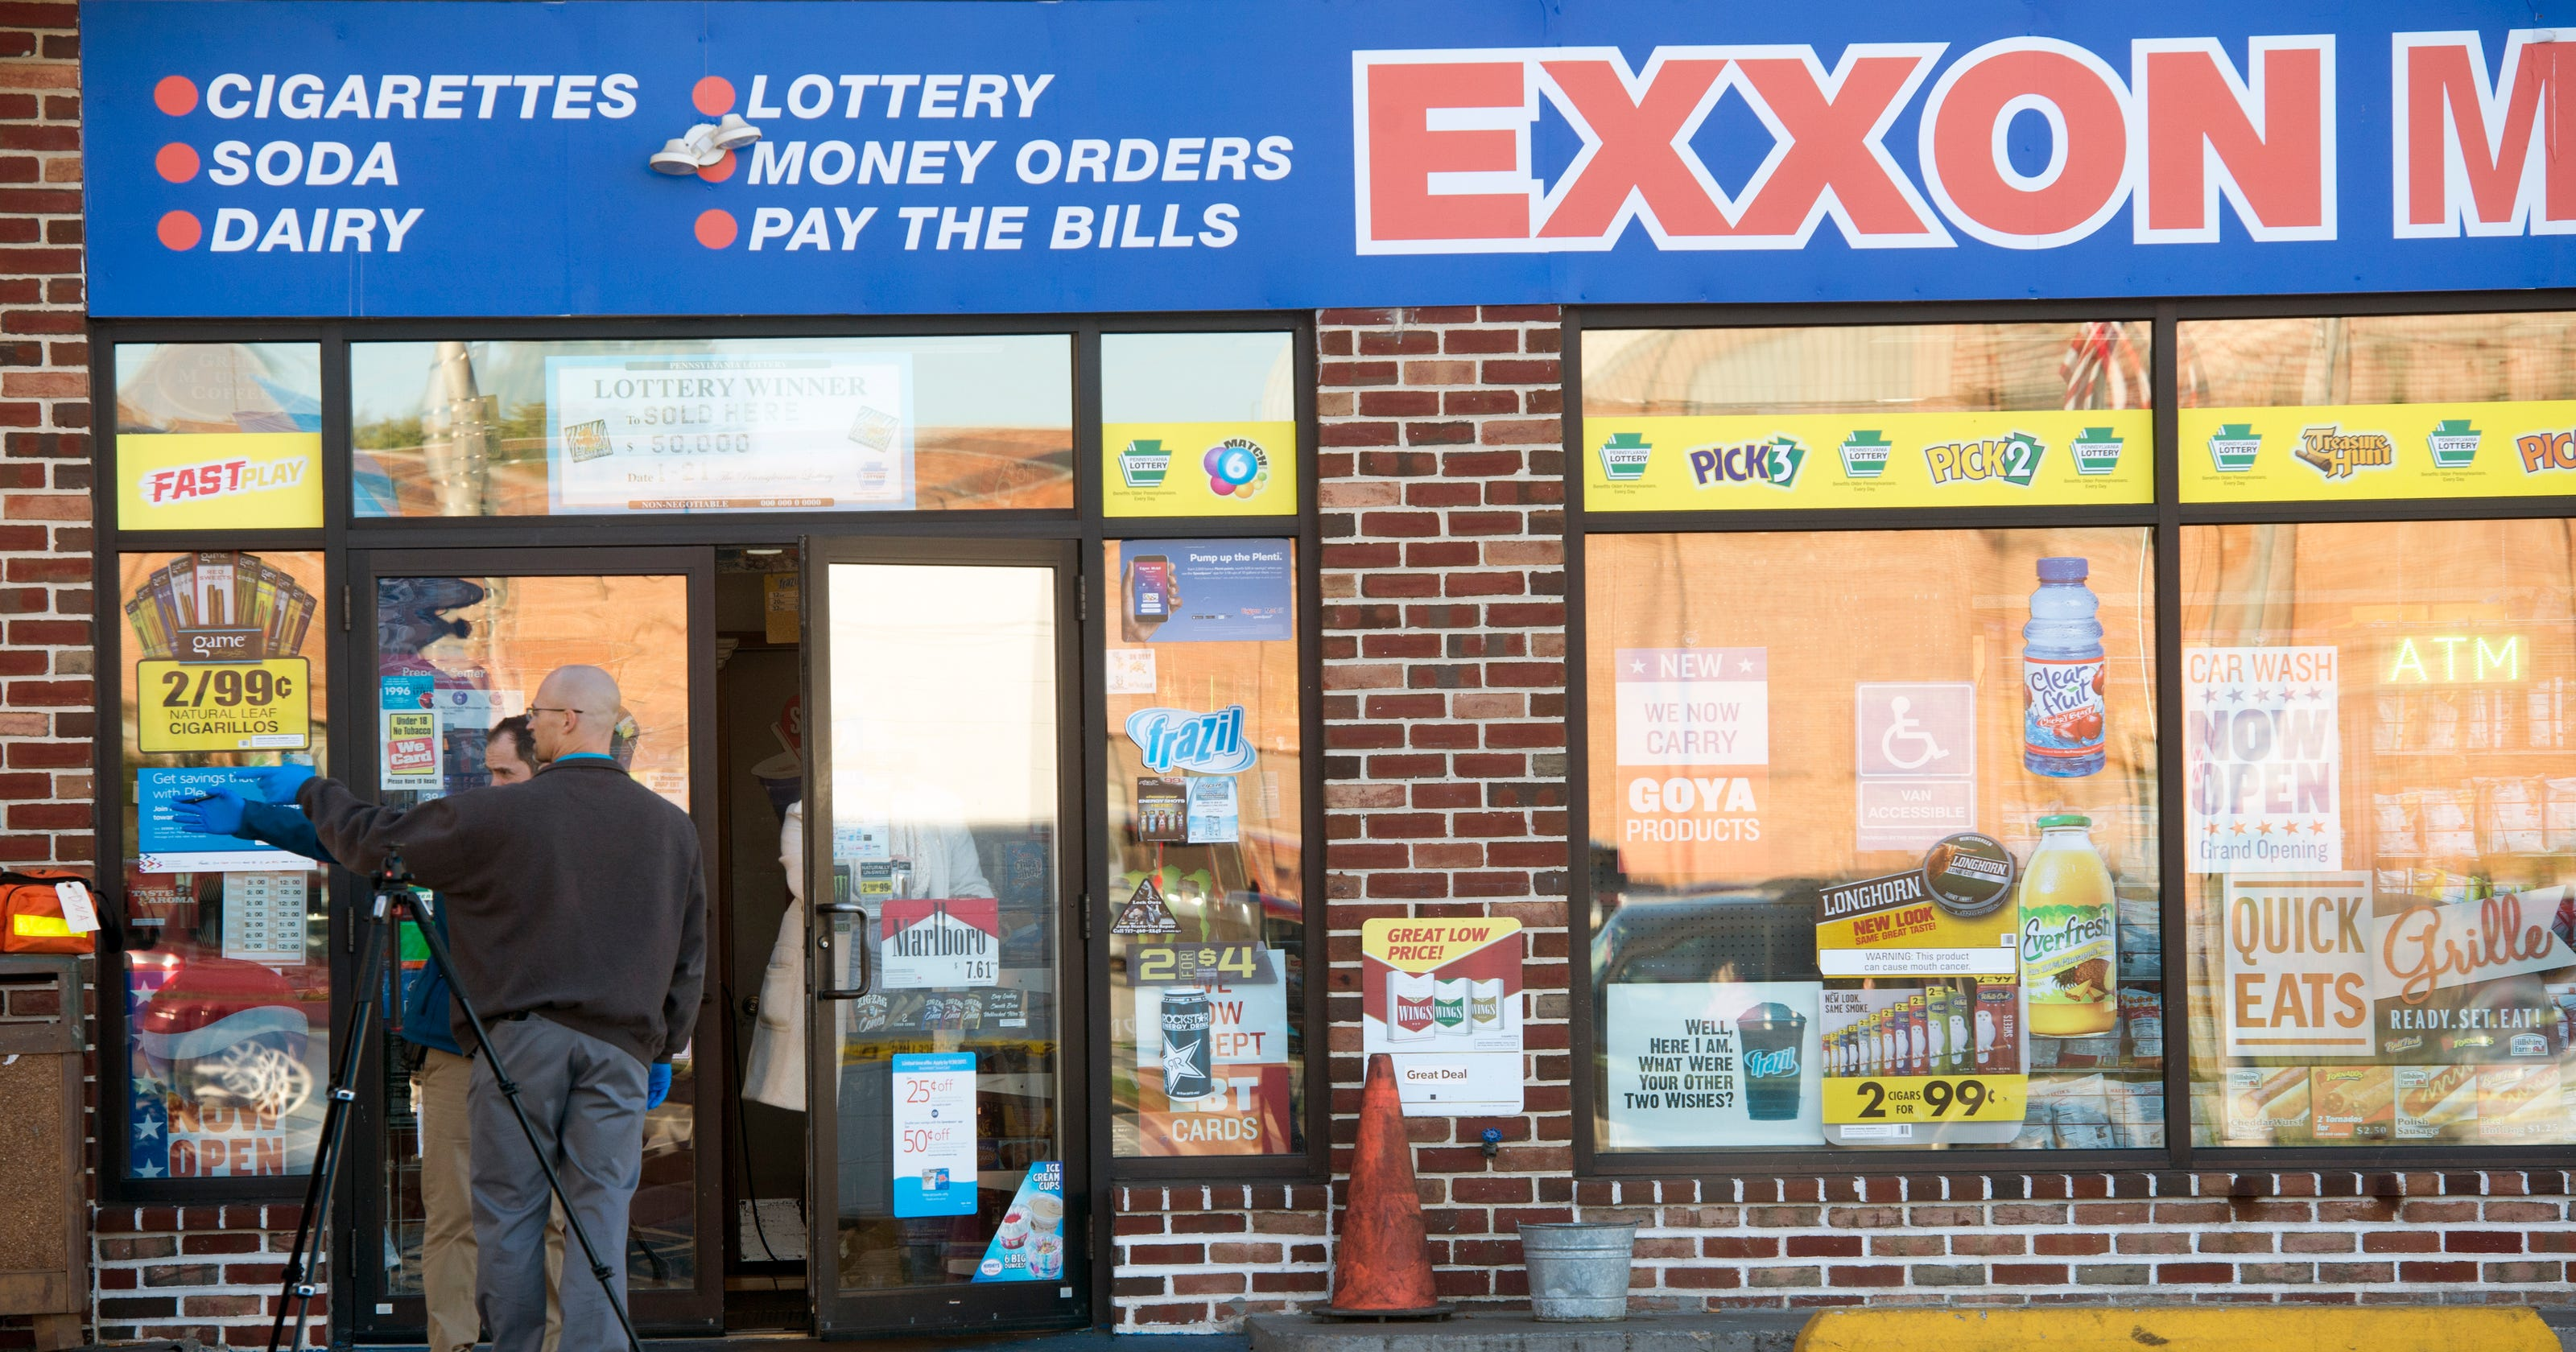 Exxon gas station shooting: Murder trial opens in York death